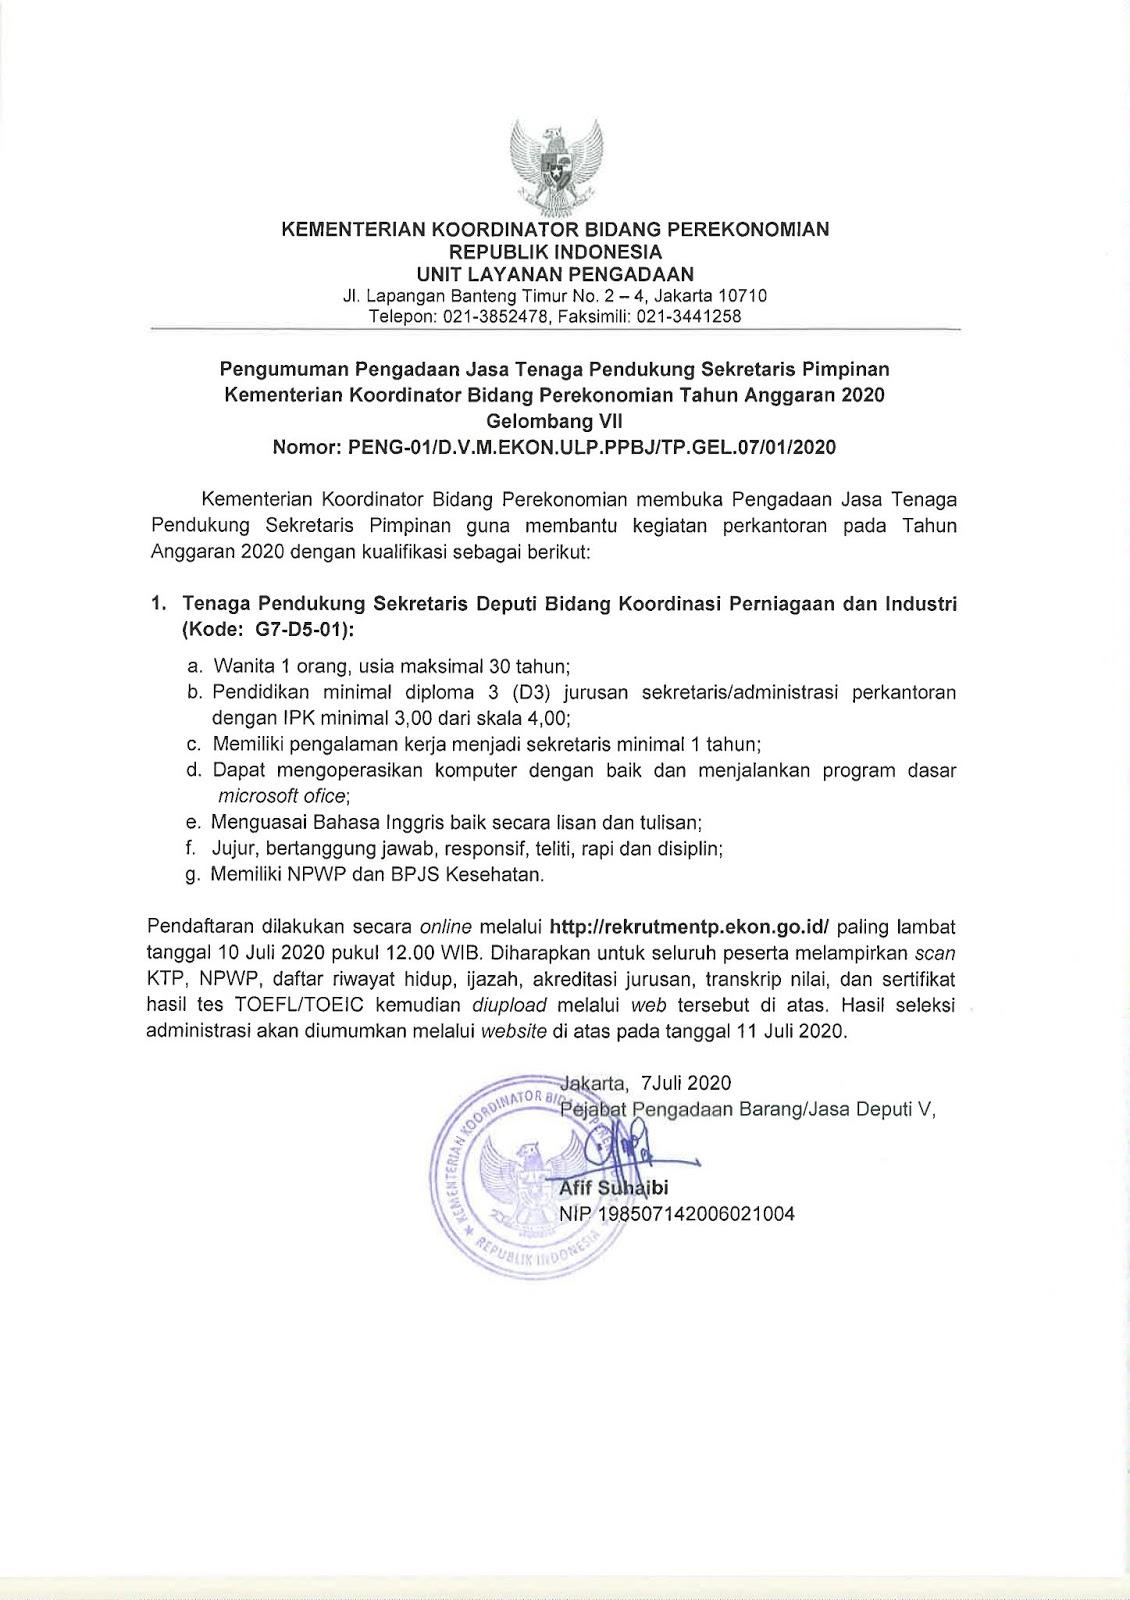 Rekrutmen Tenaga Pendukung Kementerian Koordinator Bidang Perekonomian